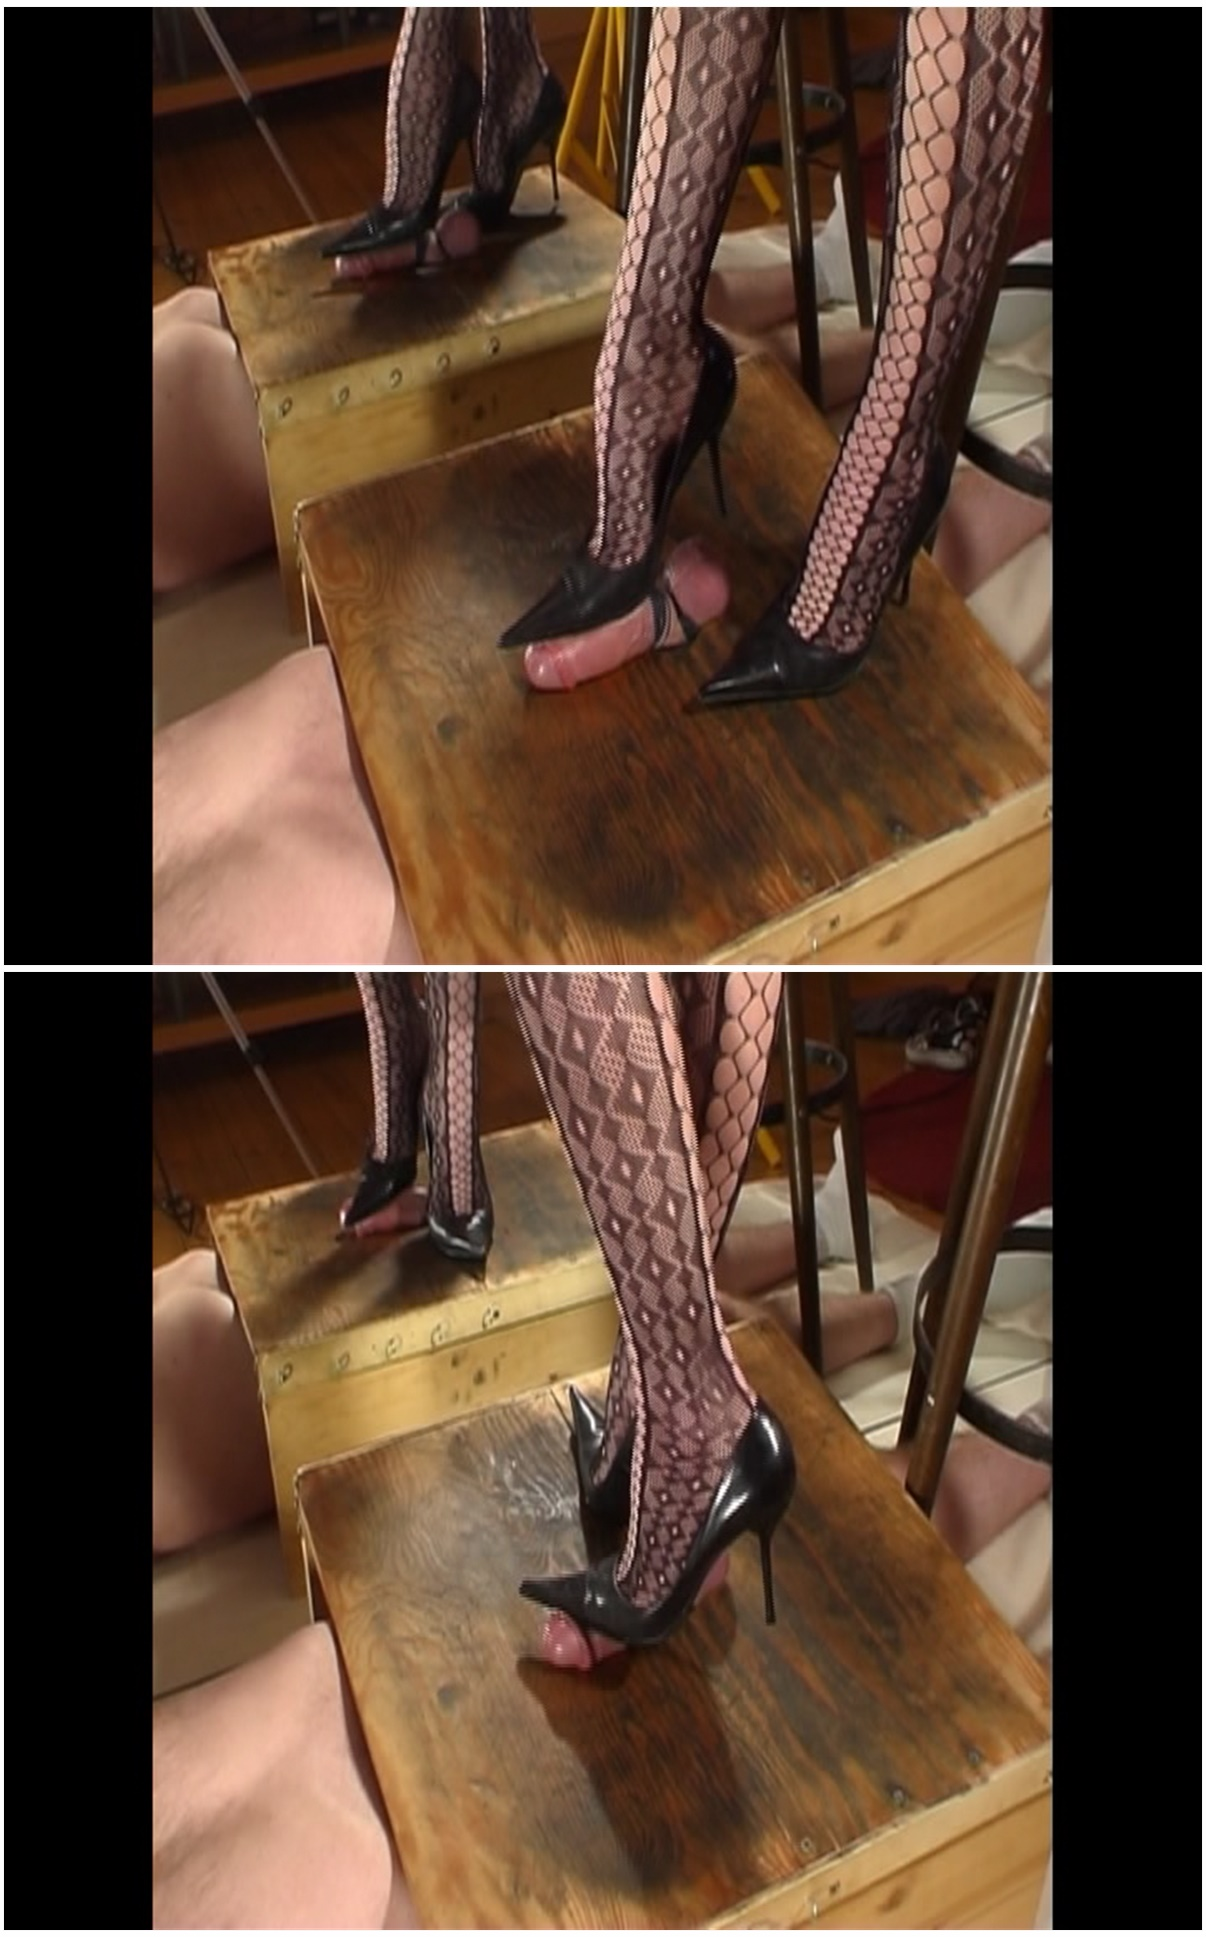 footjob-with-high-heels-1475_cover.jpg